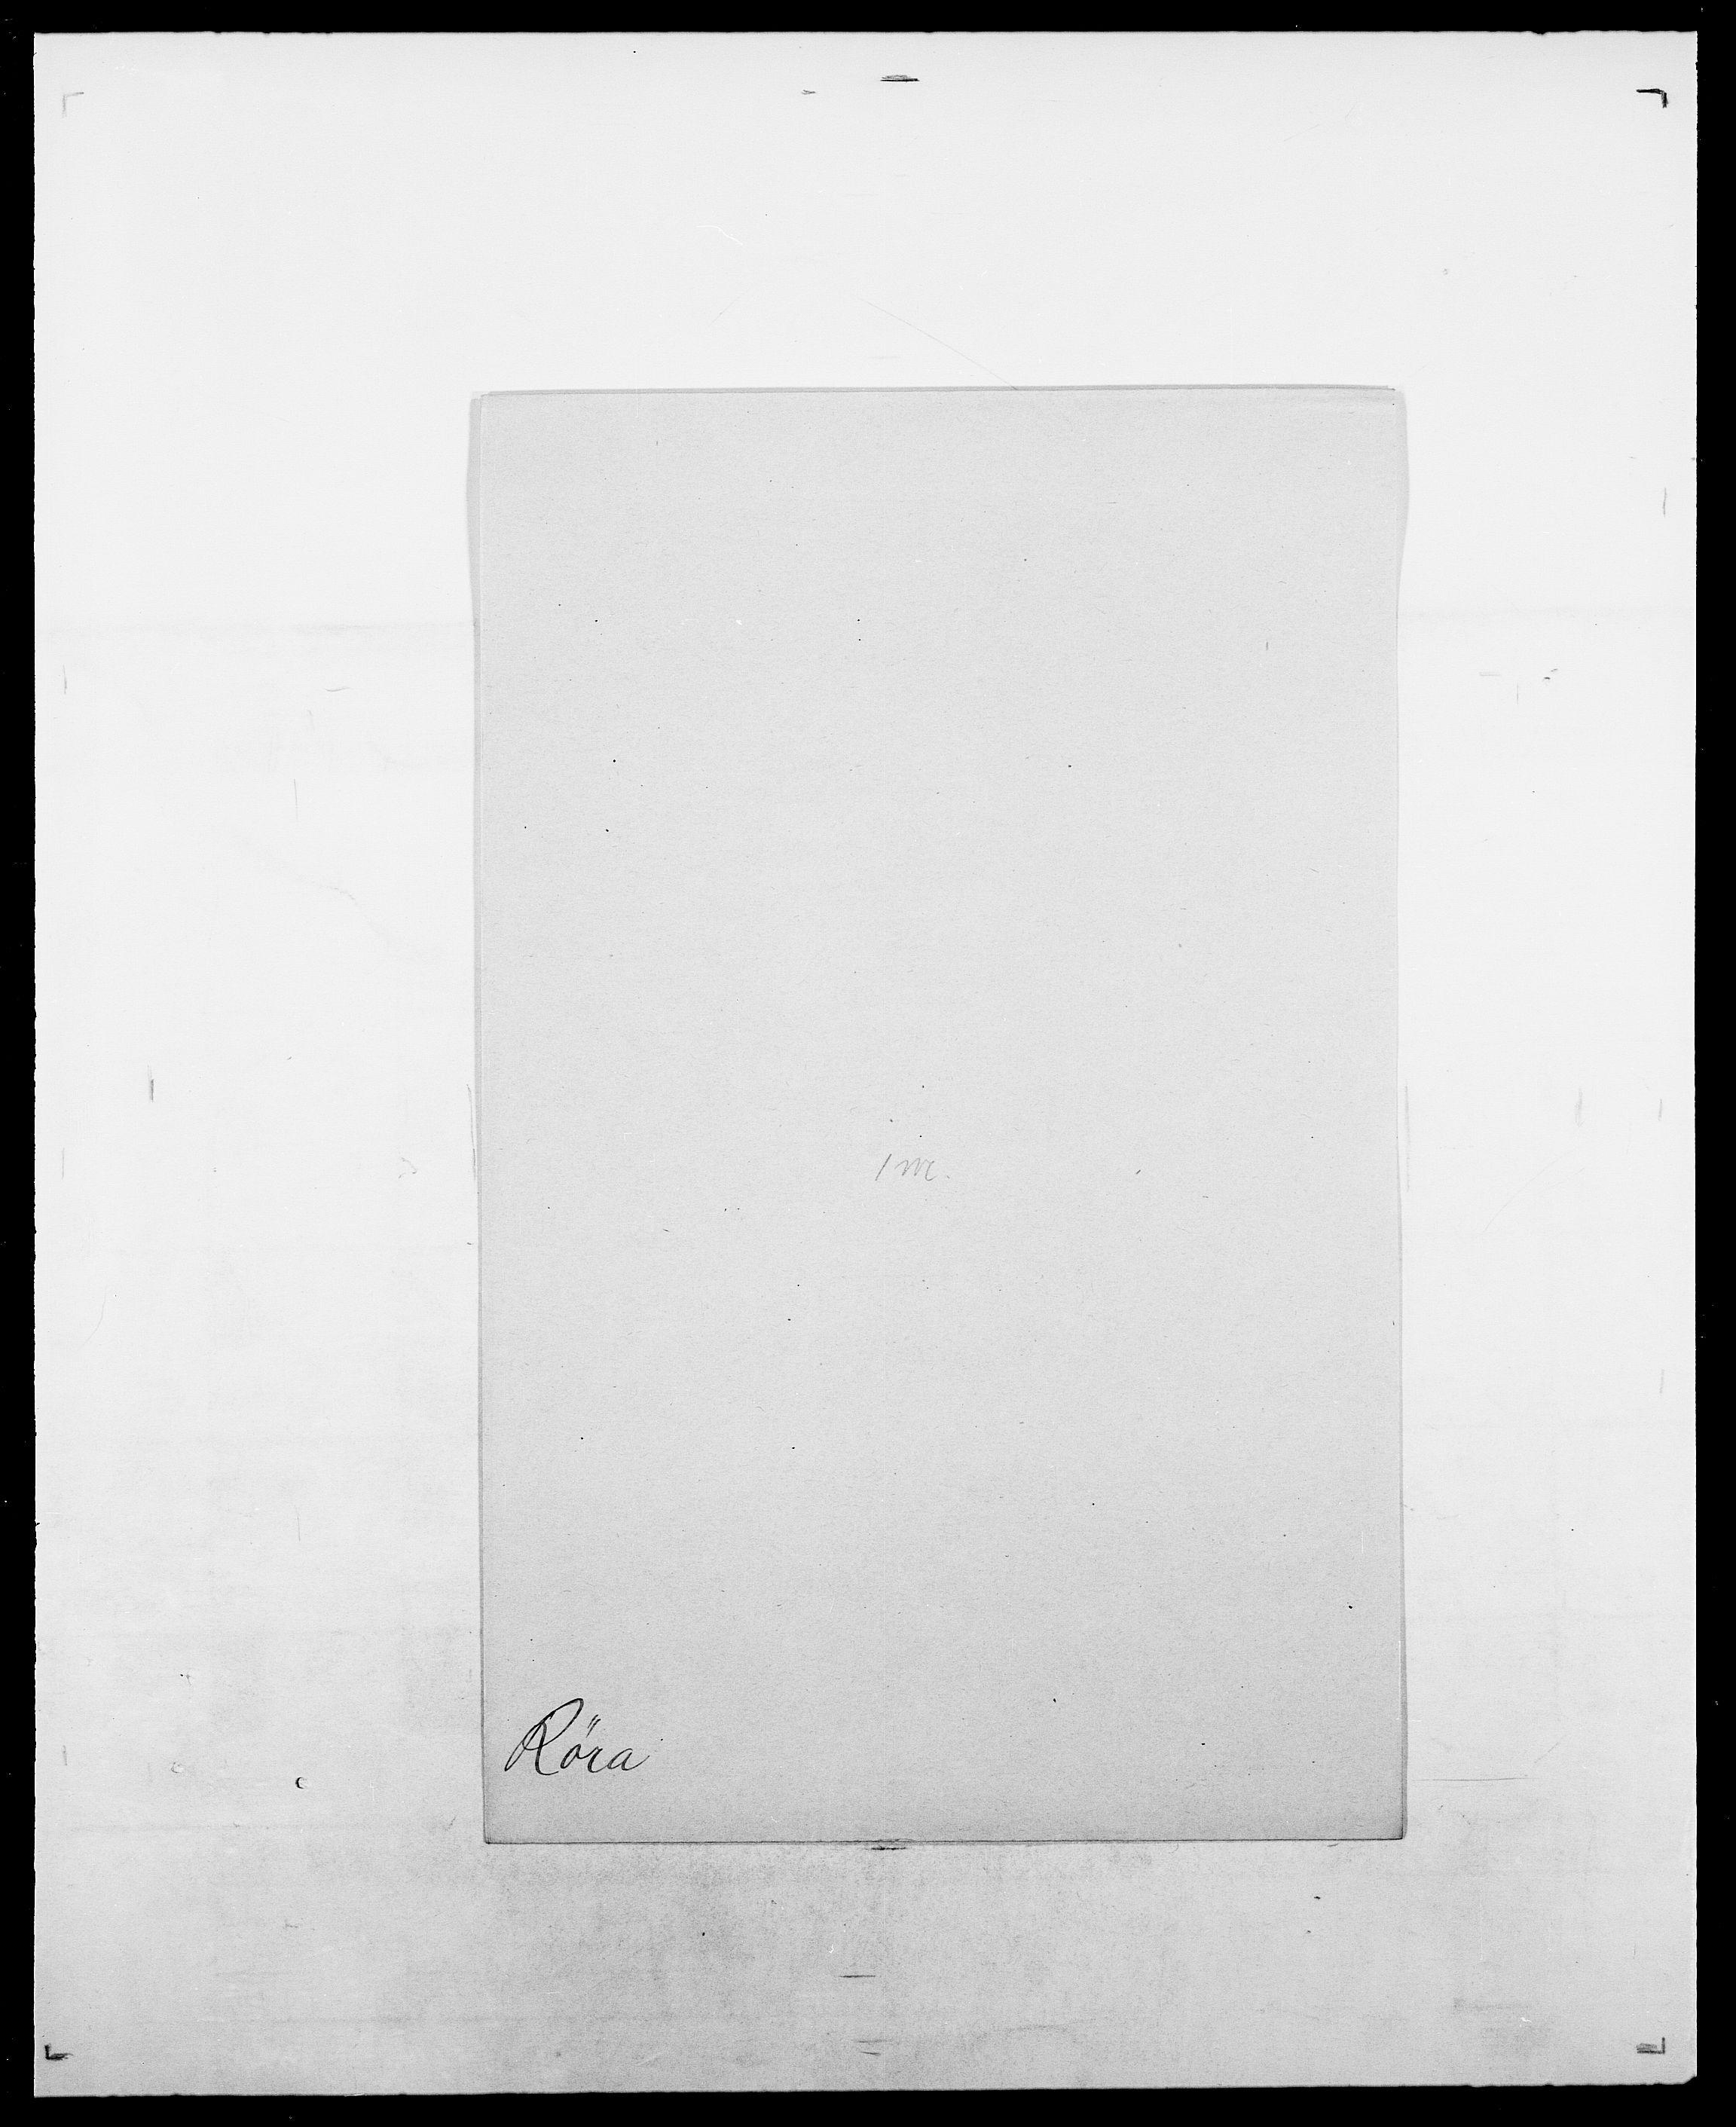 SAO, Delgobe, Charles Antoine - samling, D/Da/L0033: Roald - Røyem, s. 794